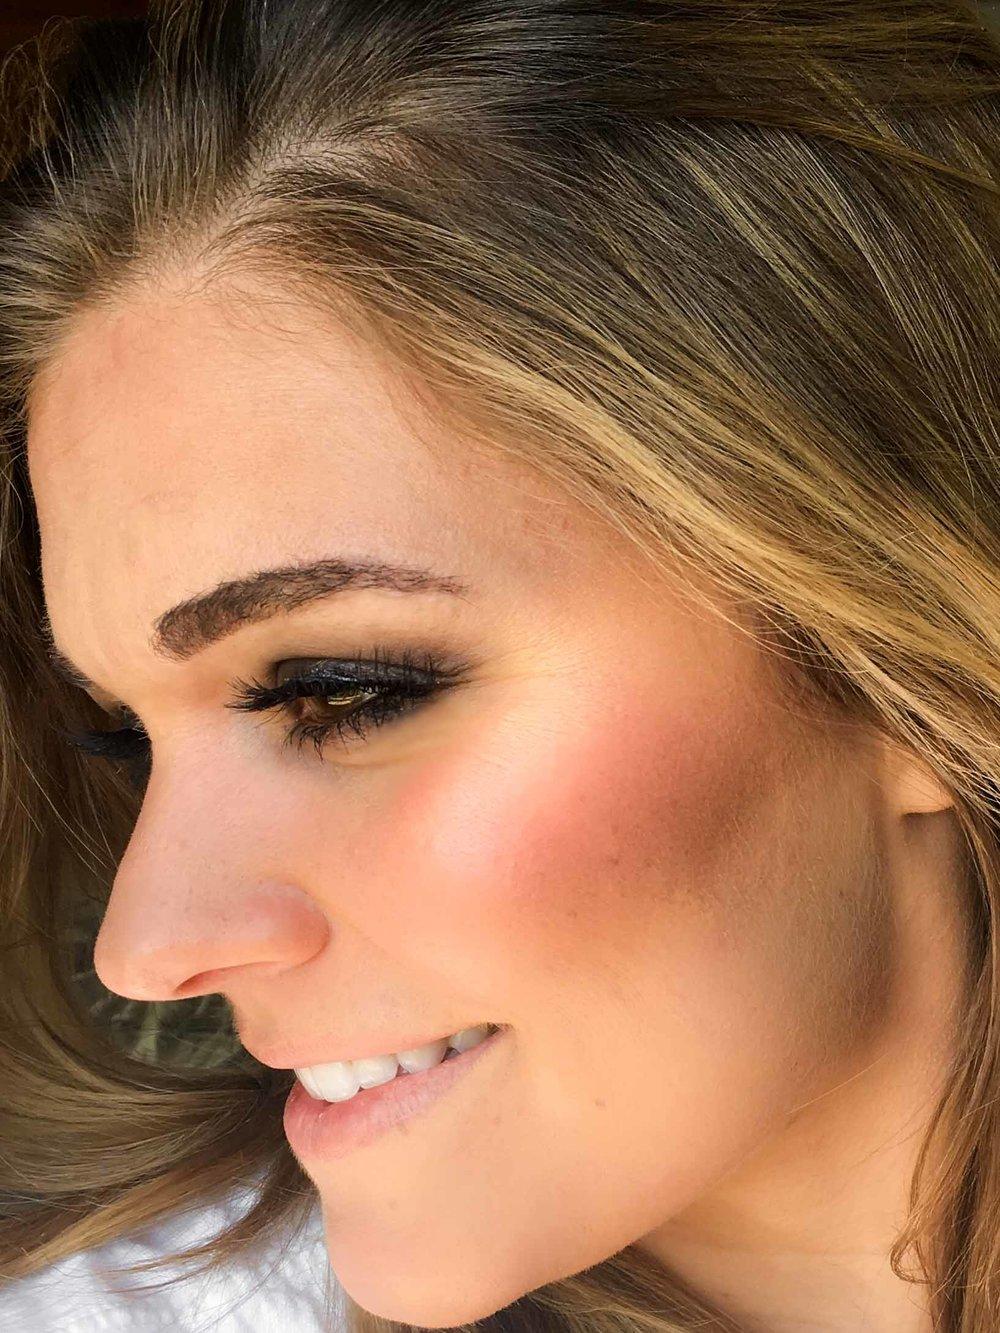 talia-whatcott-makeup-artist-utah-county-influenster-review-makeup-for-ever-artist-face-color-palette-contouring-1-15.jpg